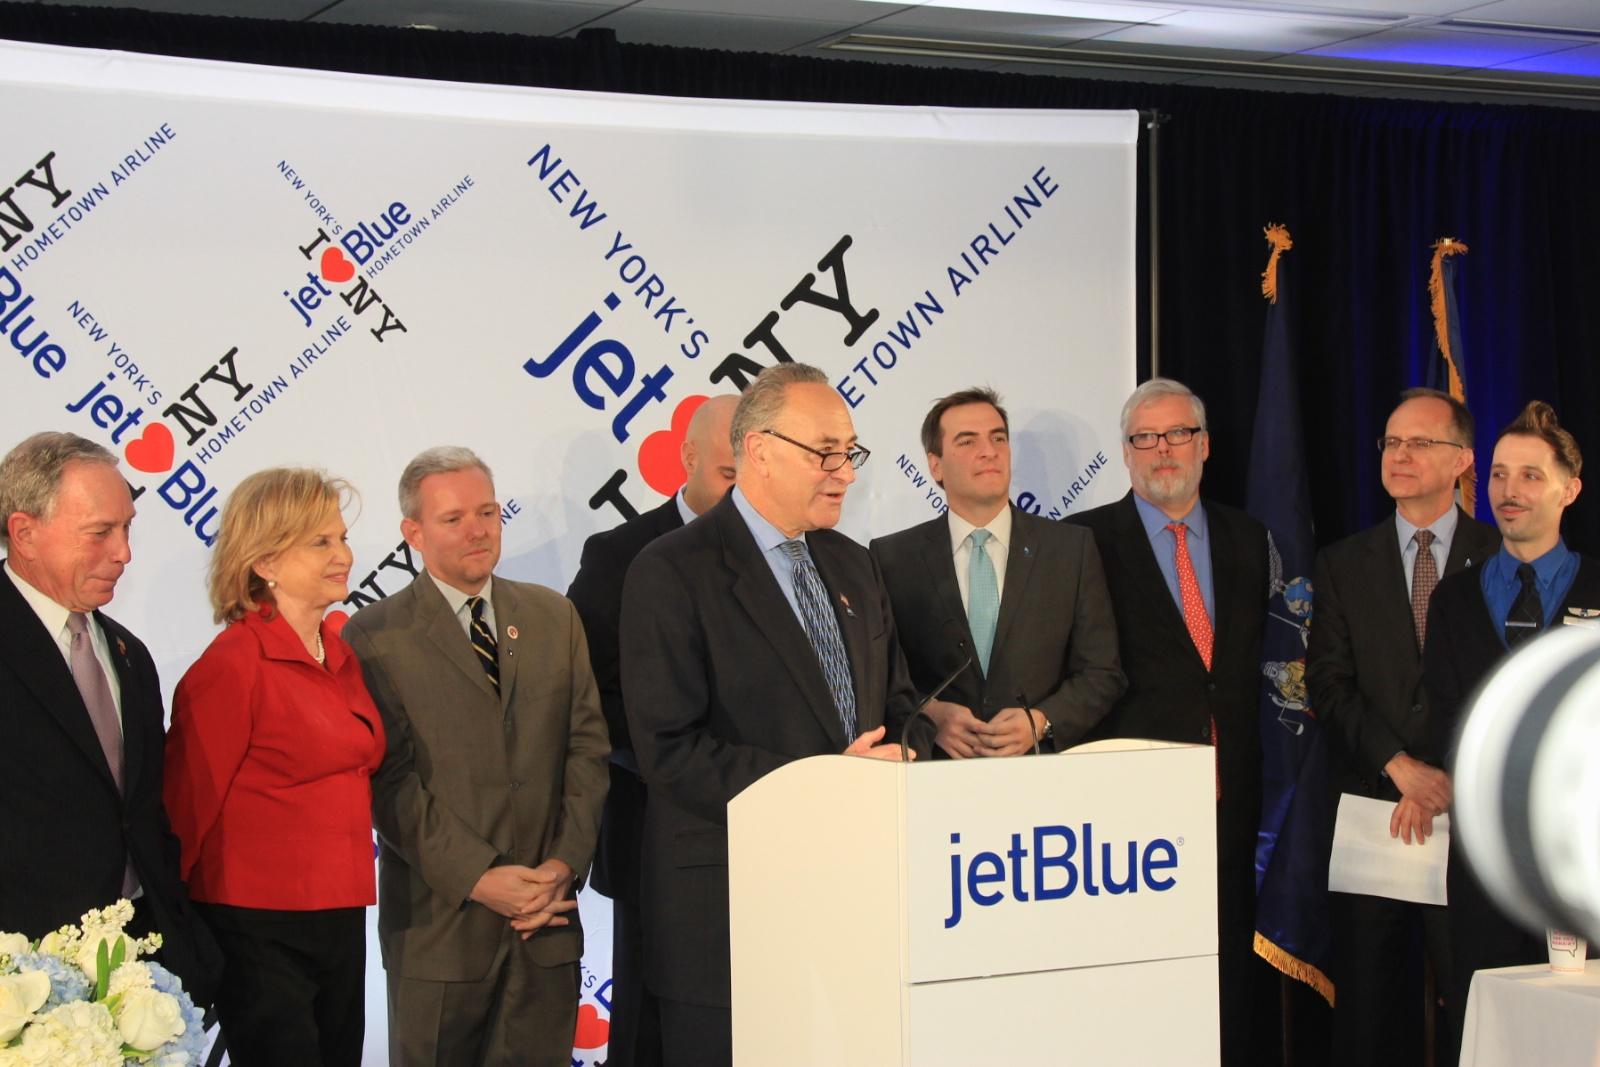 jetBlue LIC 3.jpg